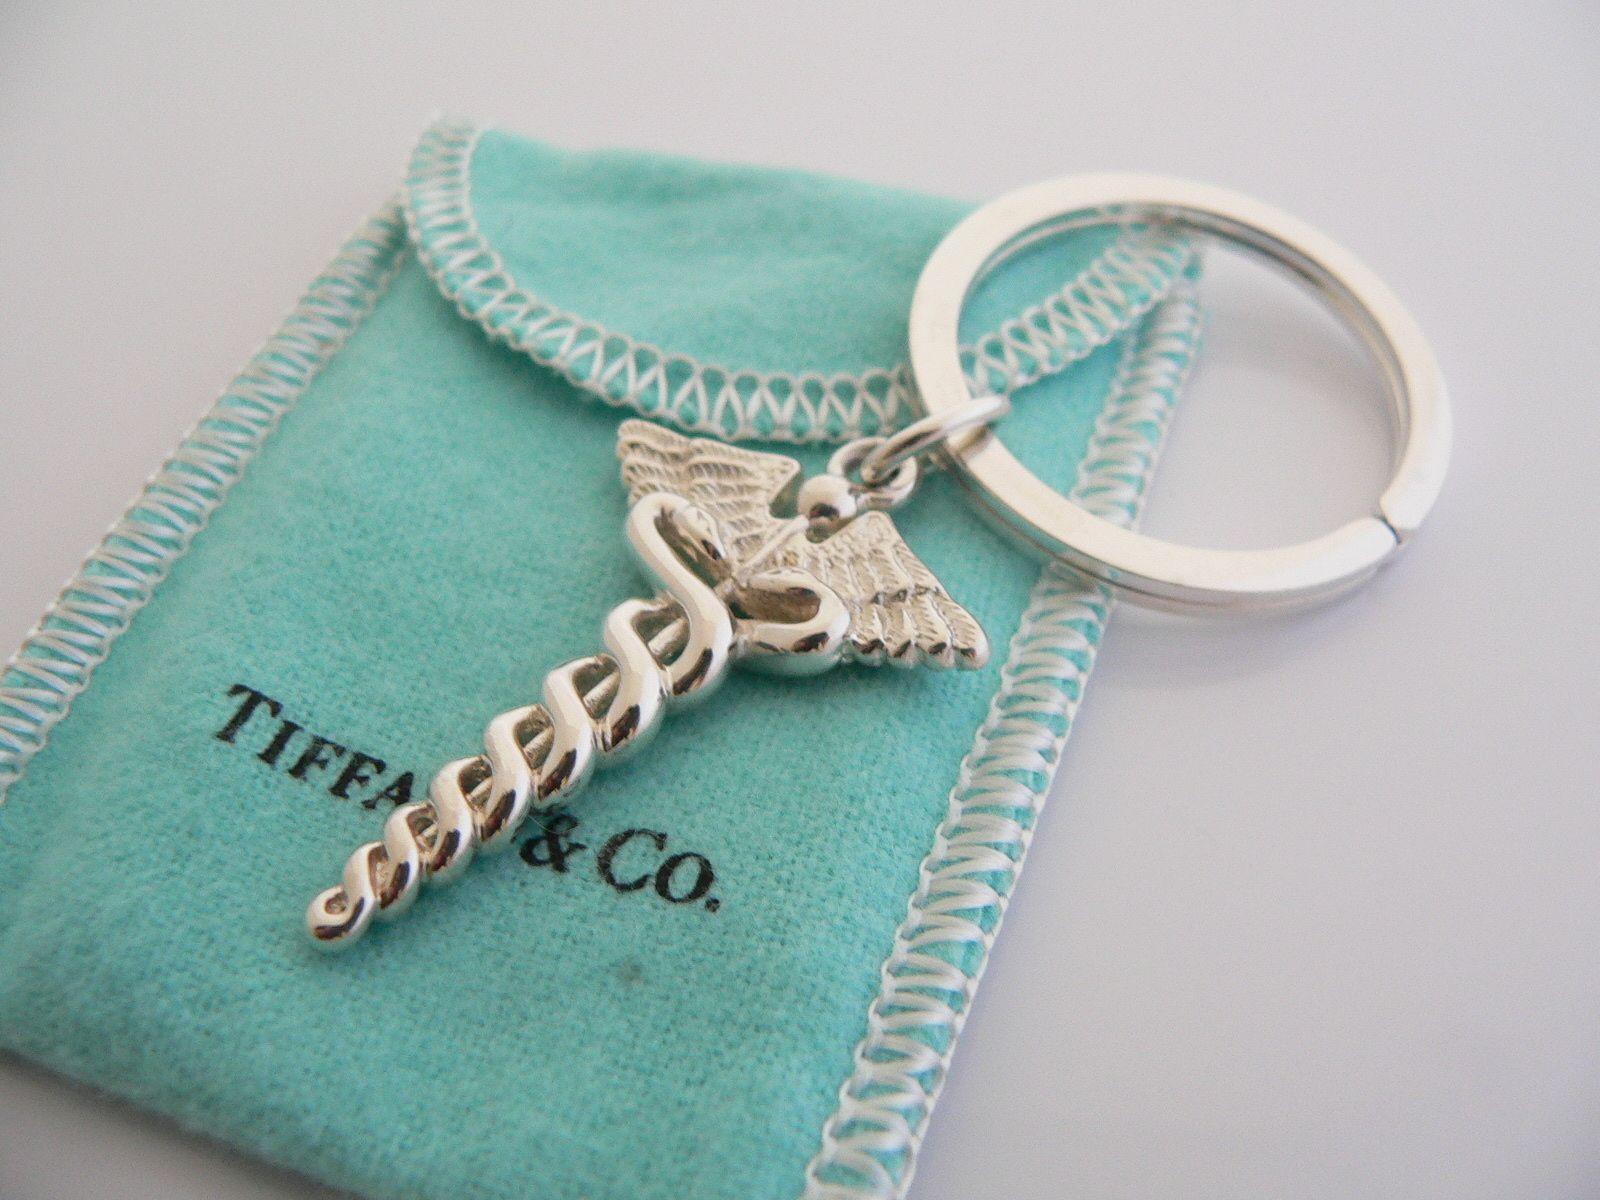 Nursing School Graduation Gift Ideas  Beautiful Tiffany & Co Keychain Great idea for grad